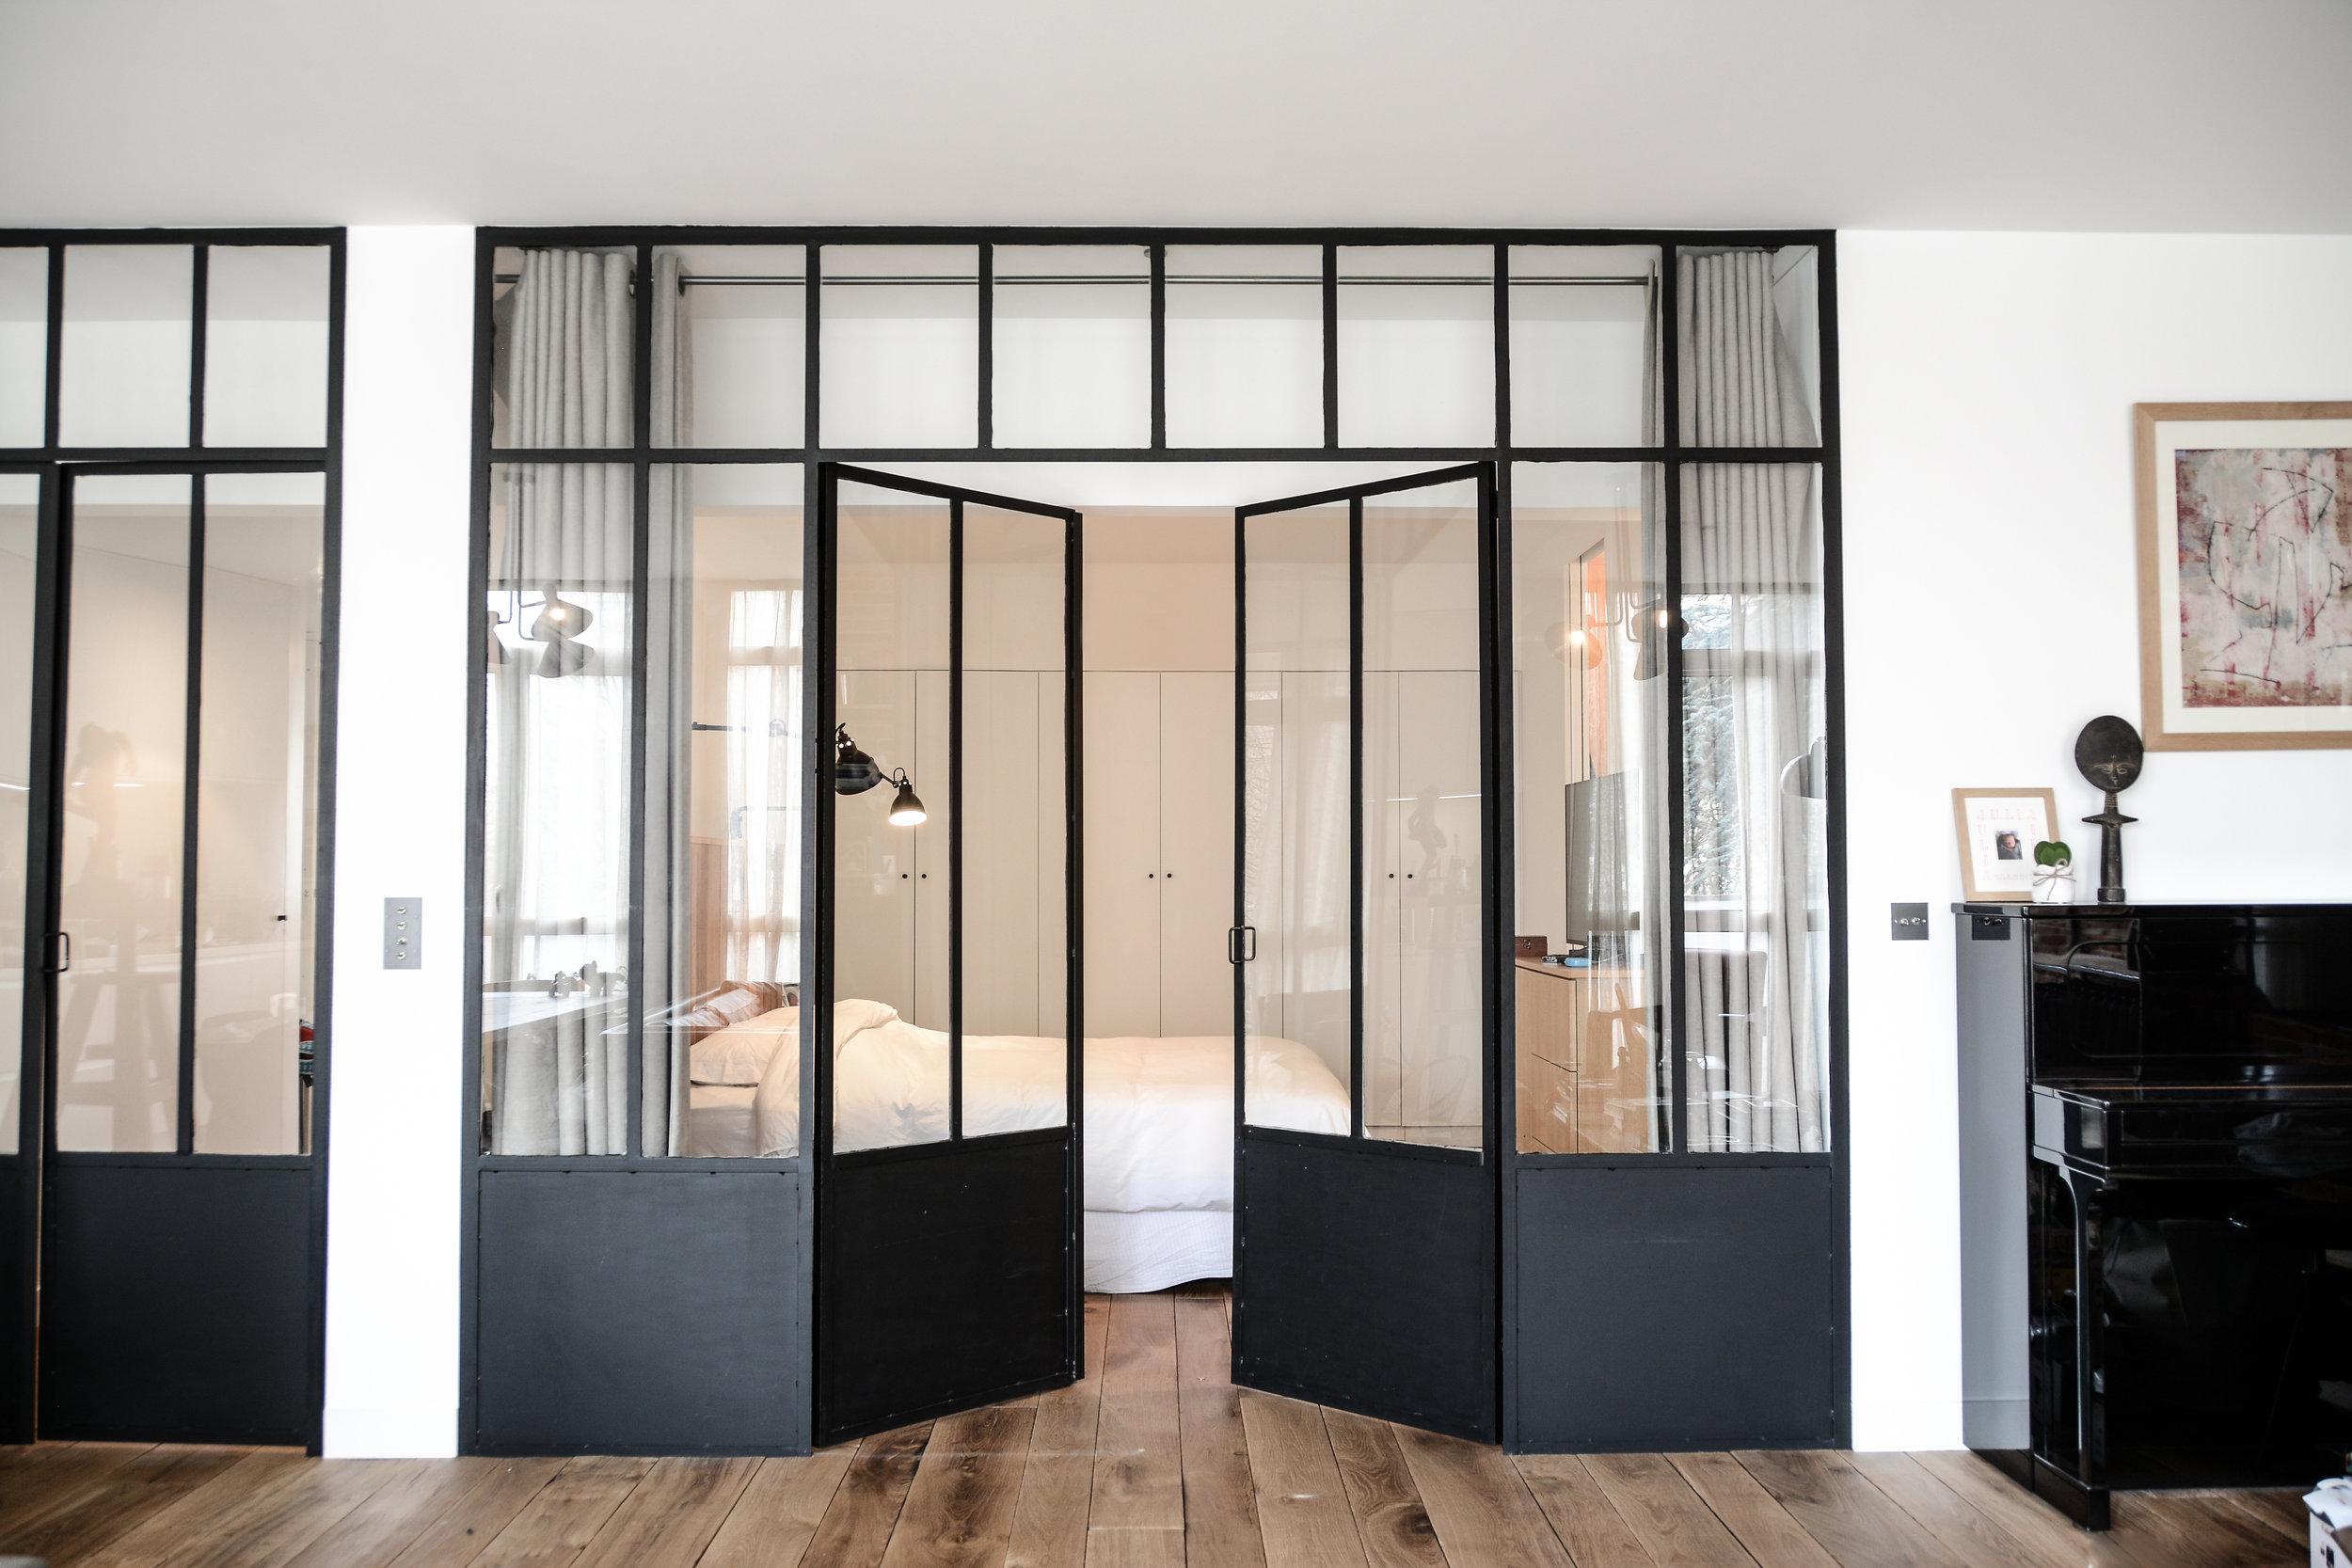 nicolasvade_architecture_interieur_design_paris_bineau_13.jpg